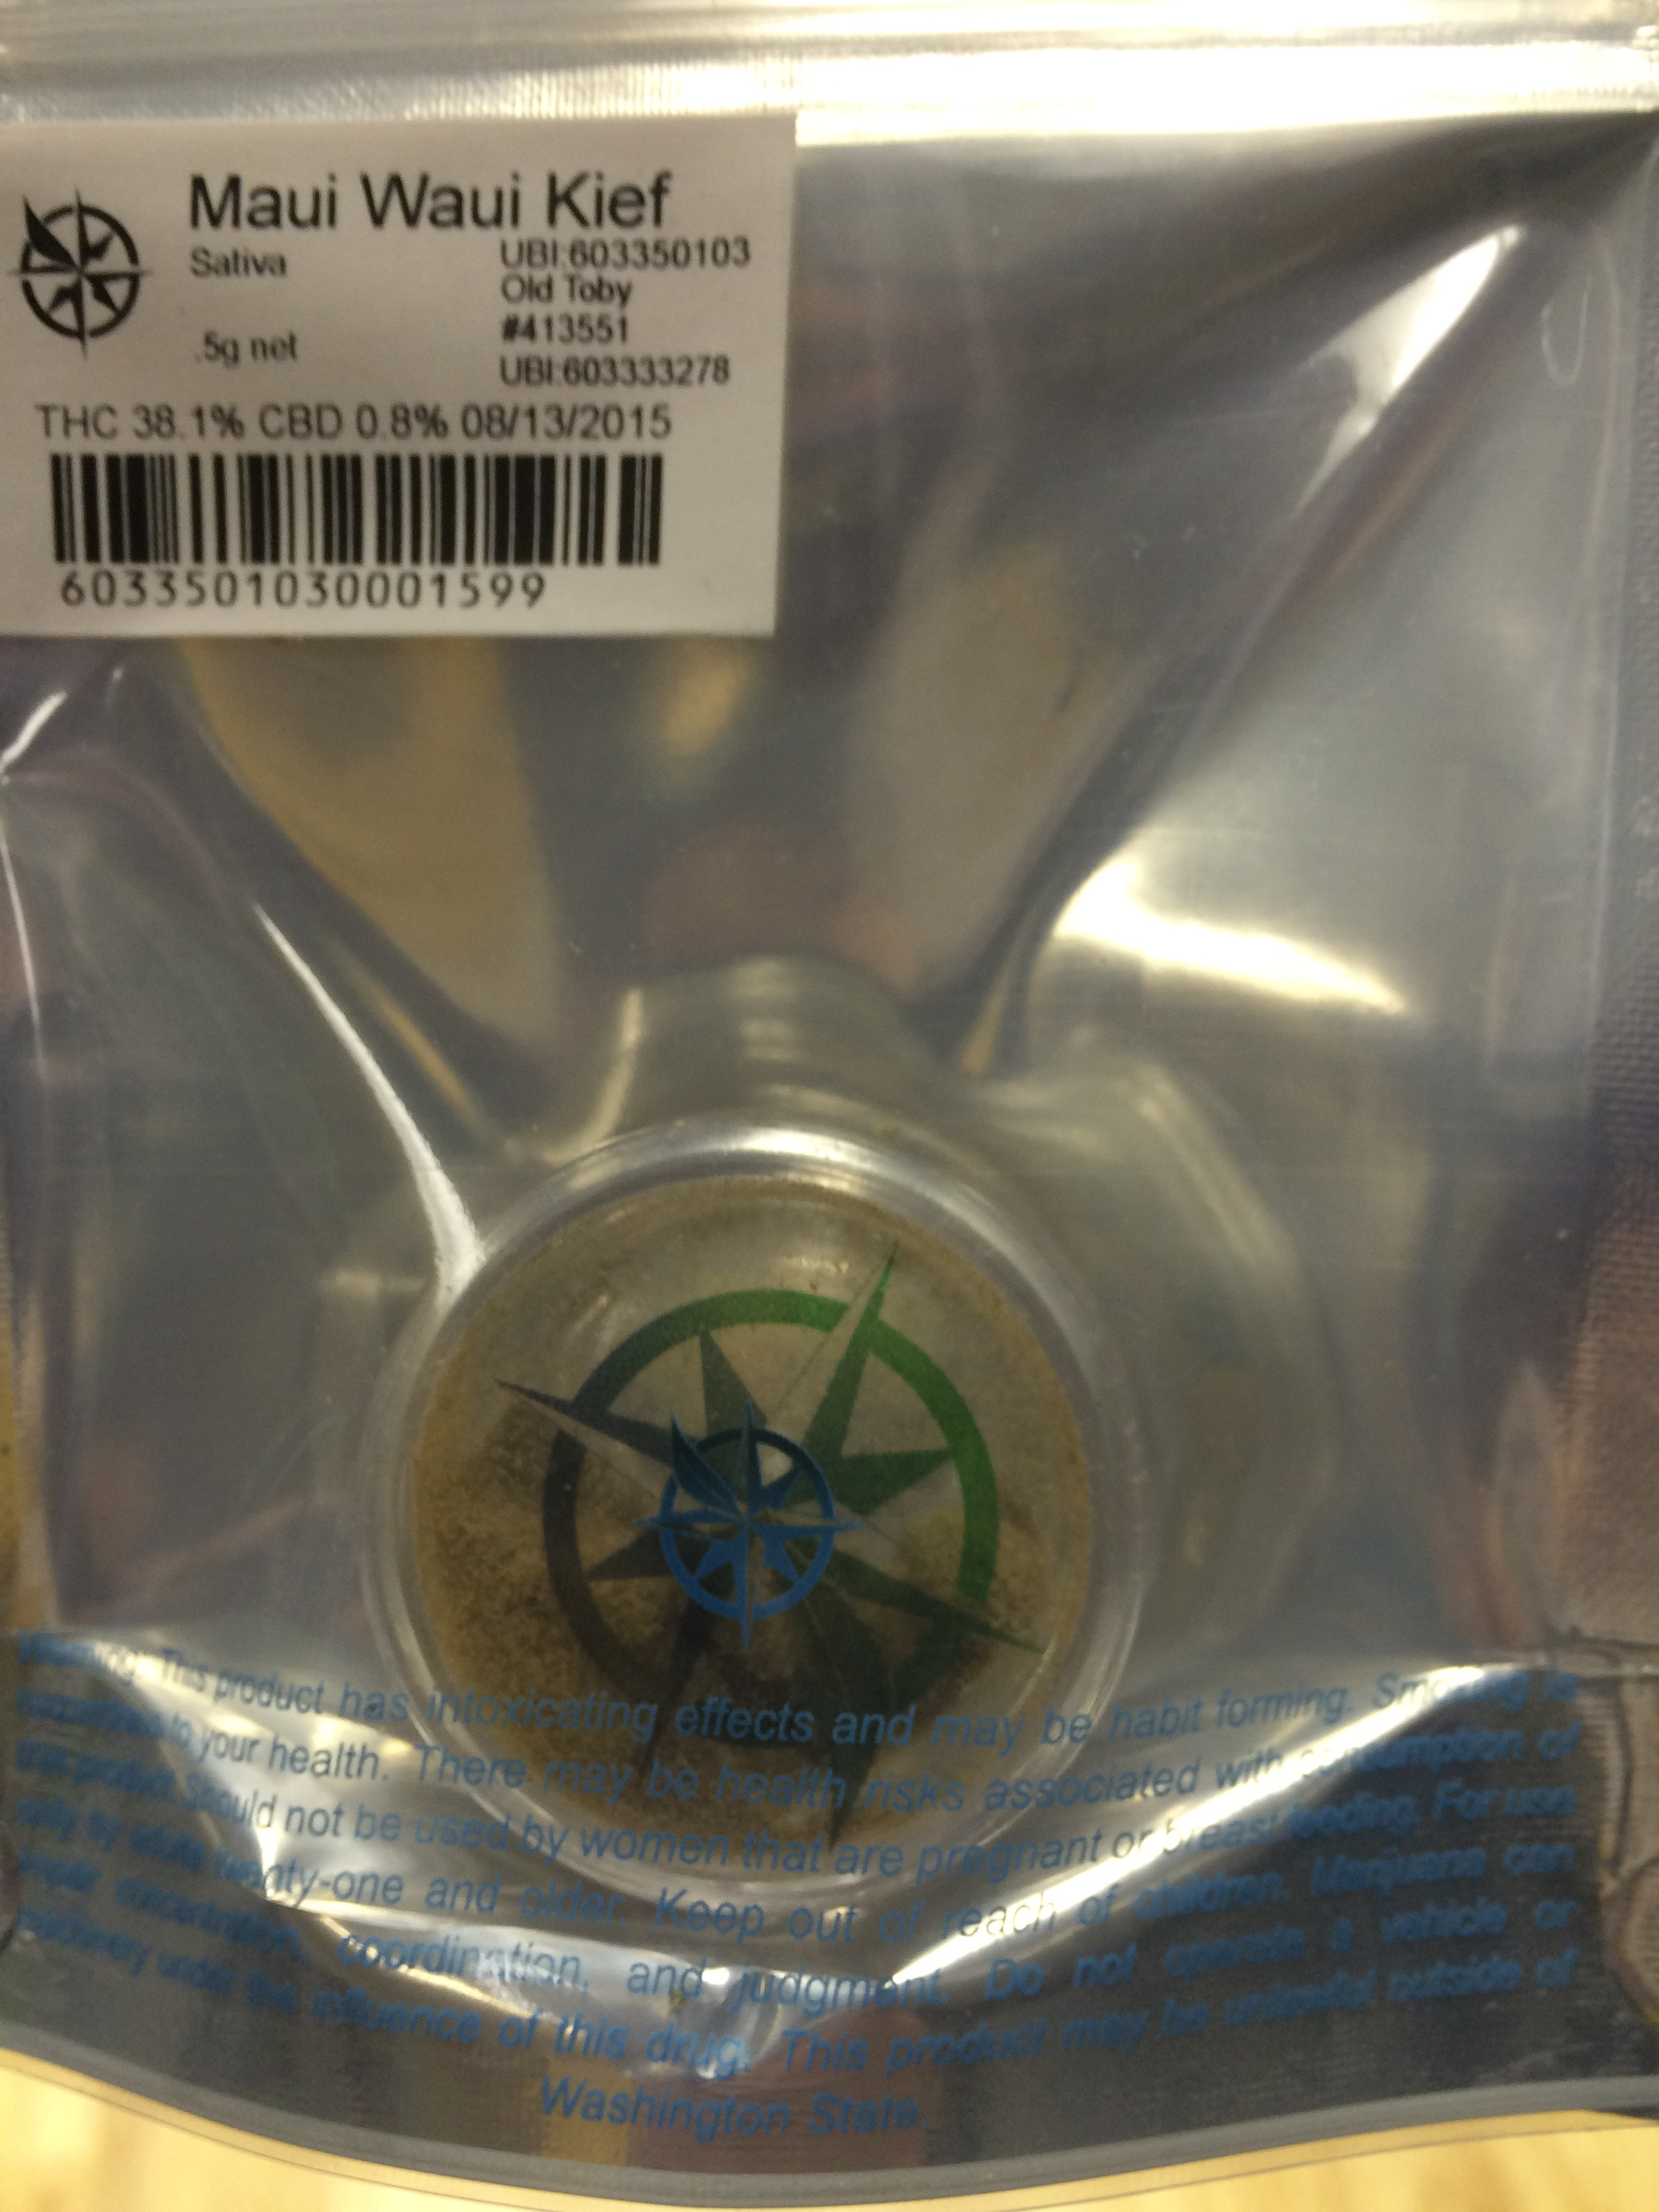 Maui Wowie Oil Cartridge Product image